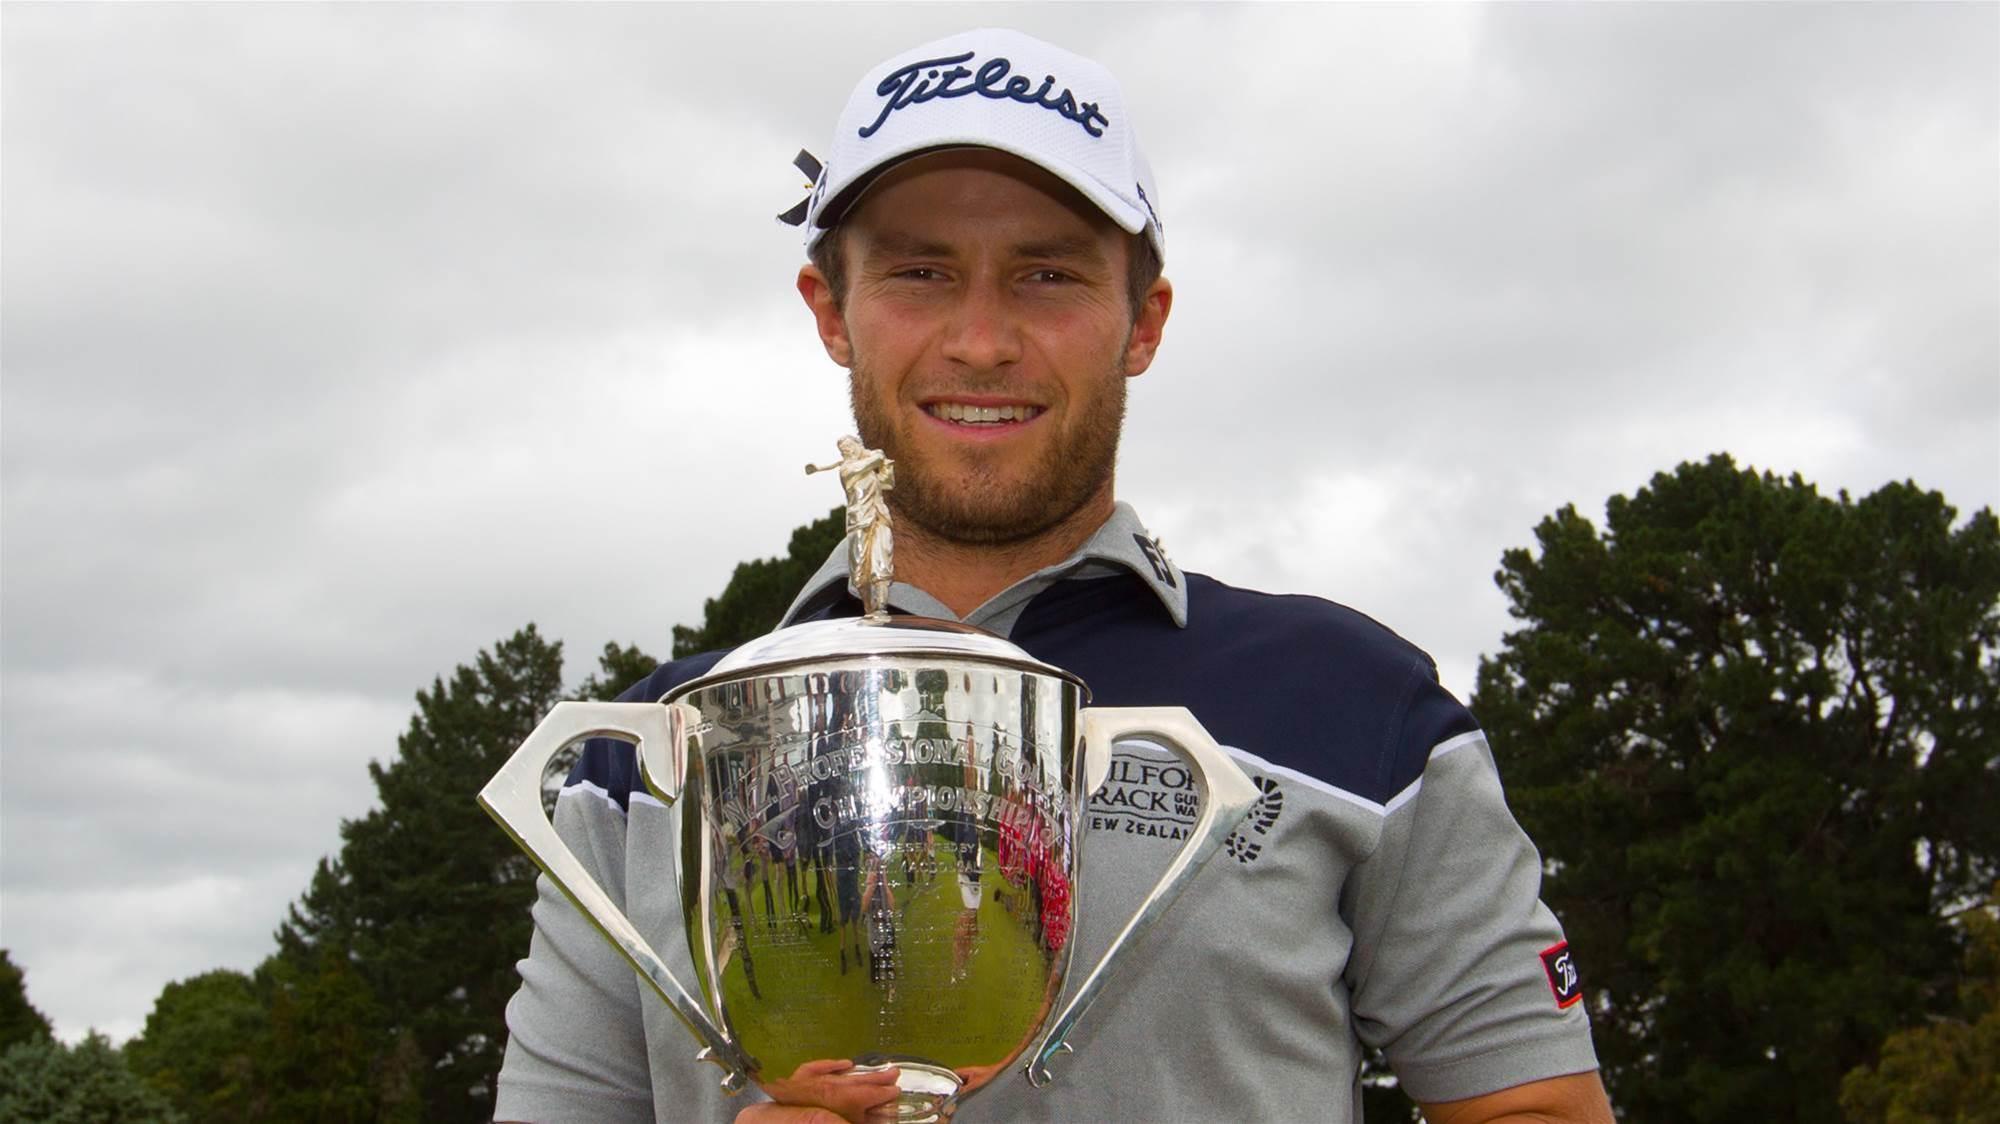 2019 NZPGA Championship to take place at Pegasus Golf and Sports Club